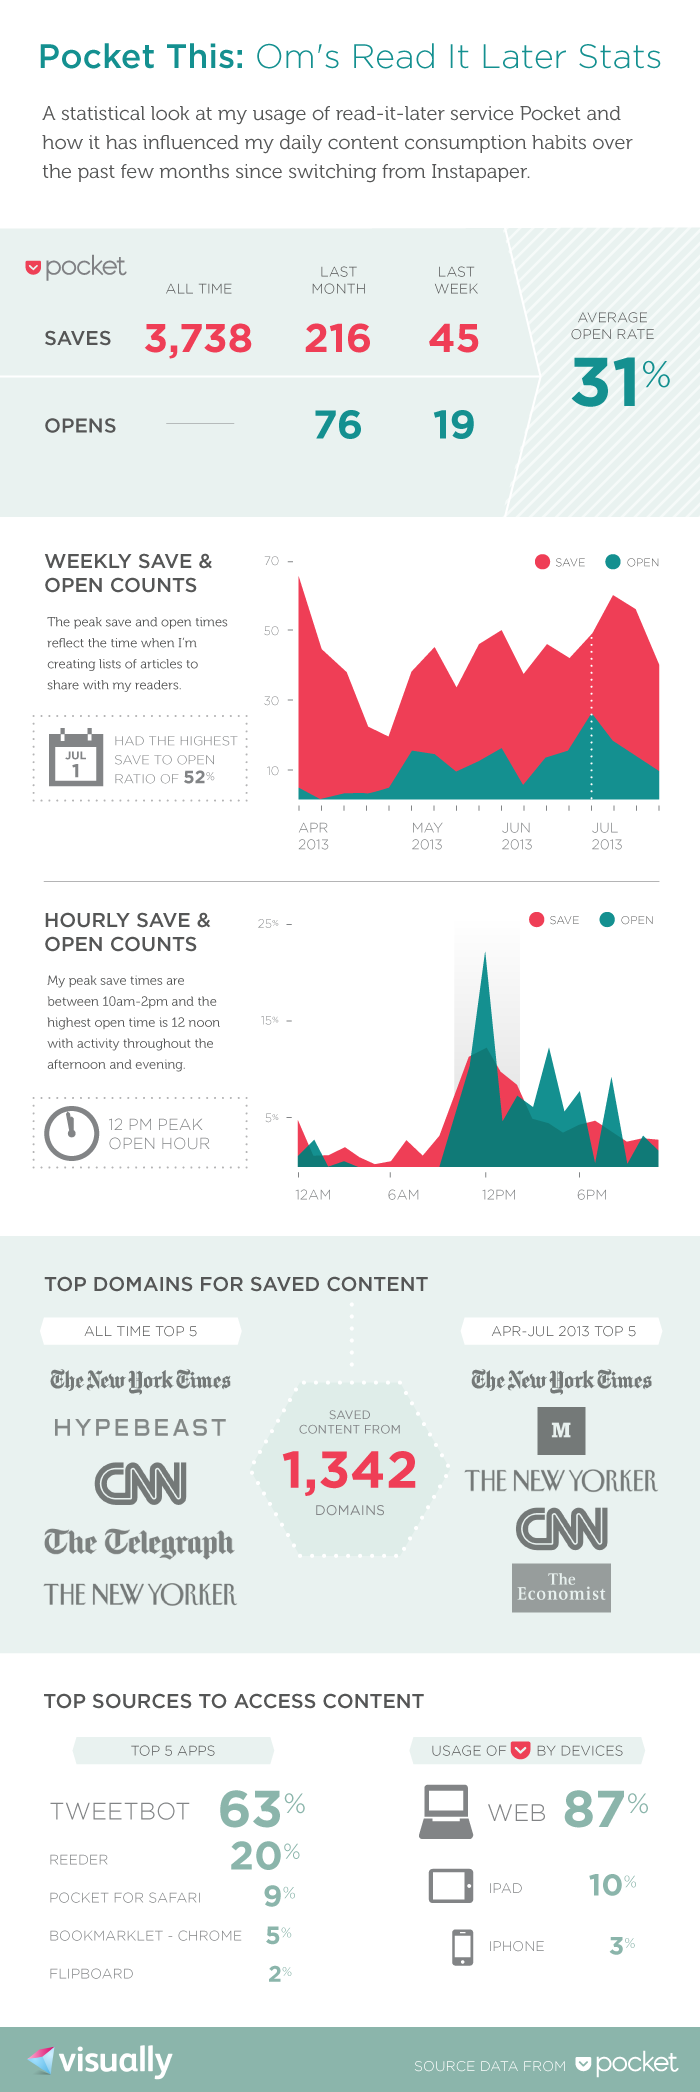 OmMalik_Pocket_Infographic_11379_521